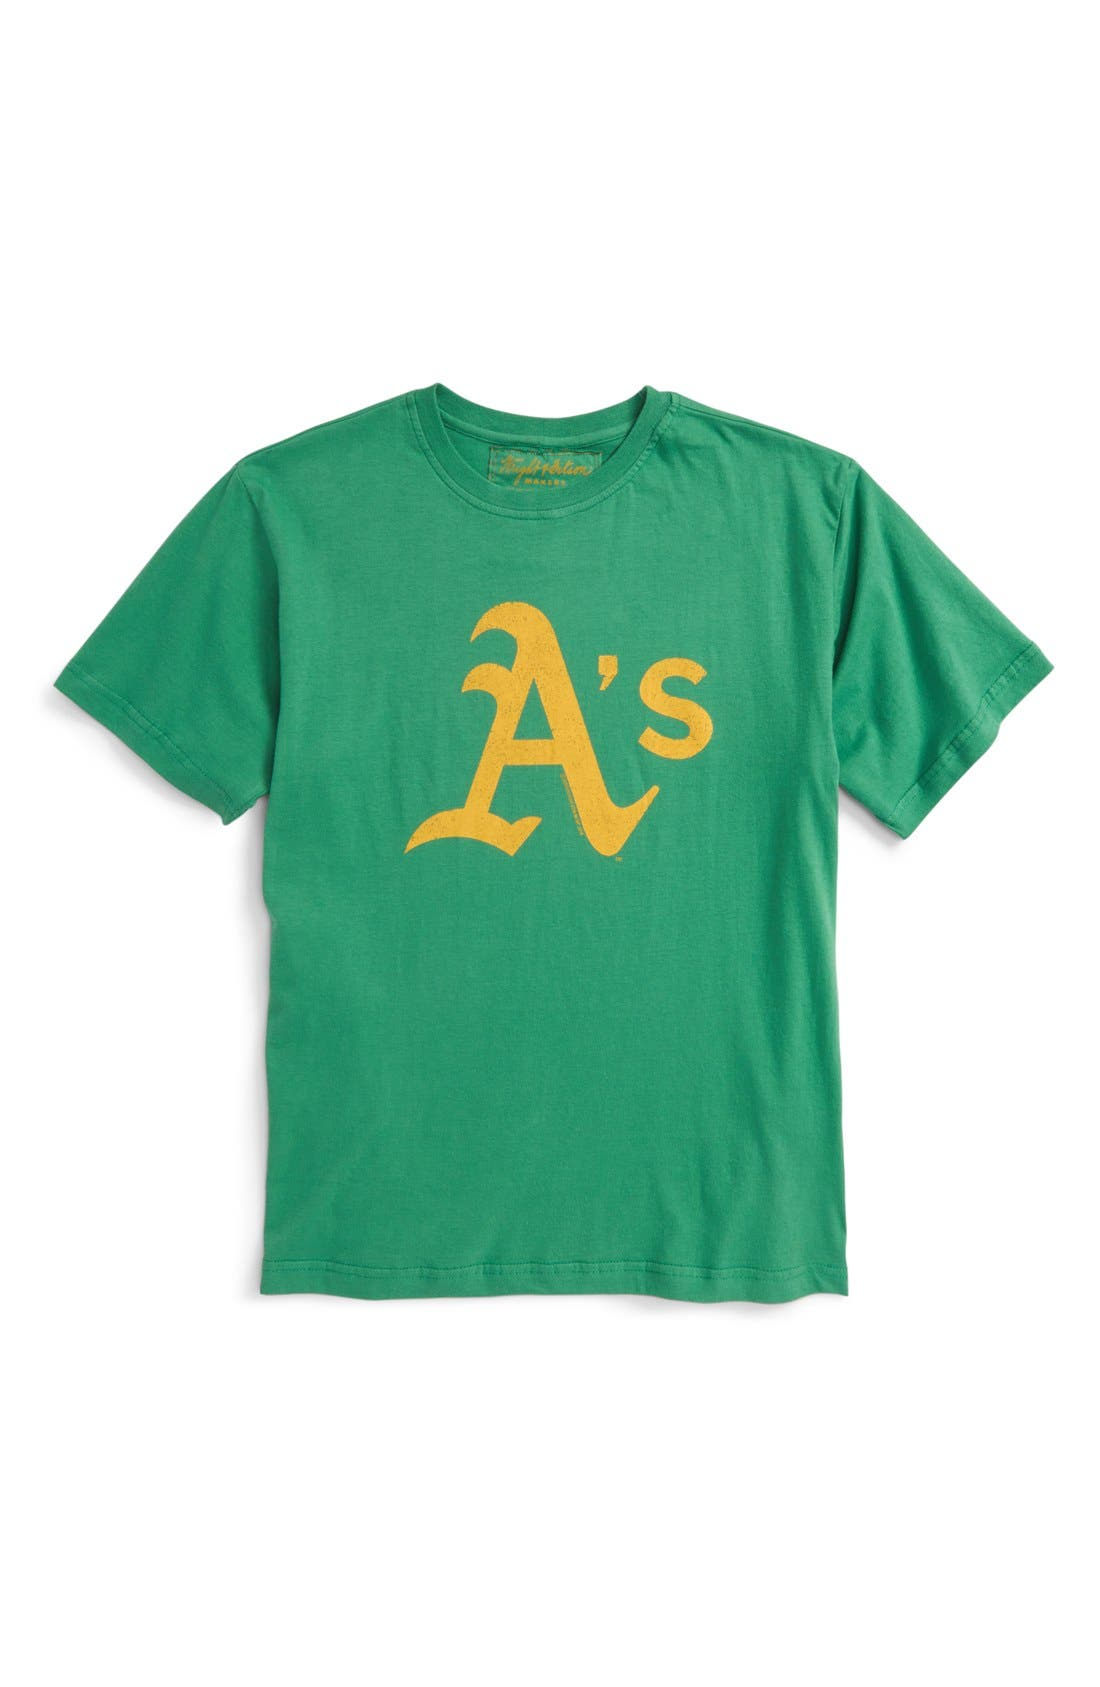 Main Image - Wright & Ditson 'Oakland Athletics' T-Shirt (Little Boys & Big Boys)